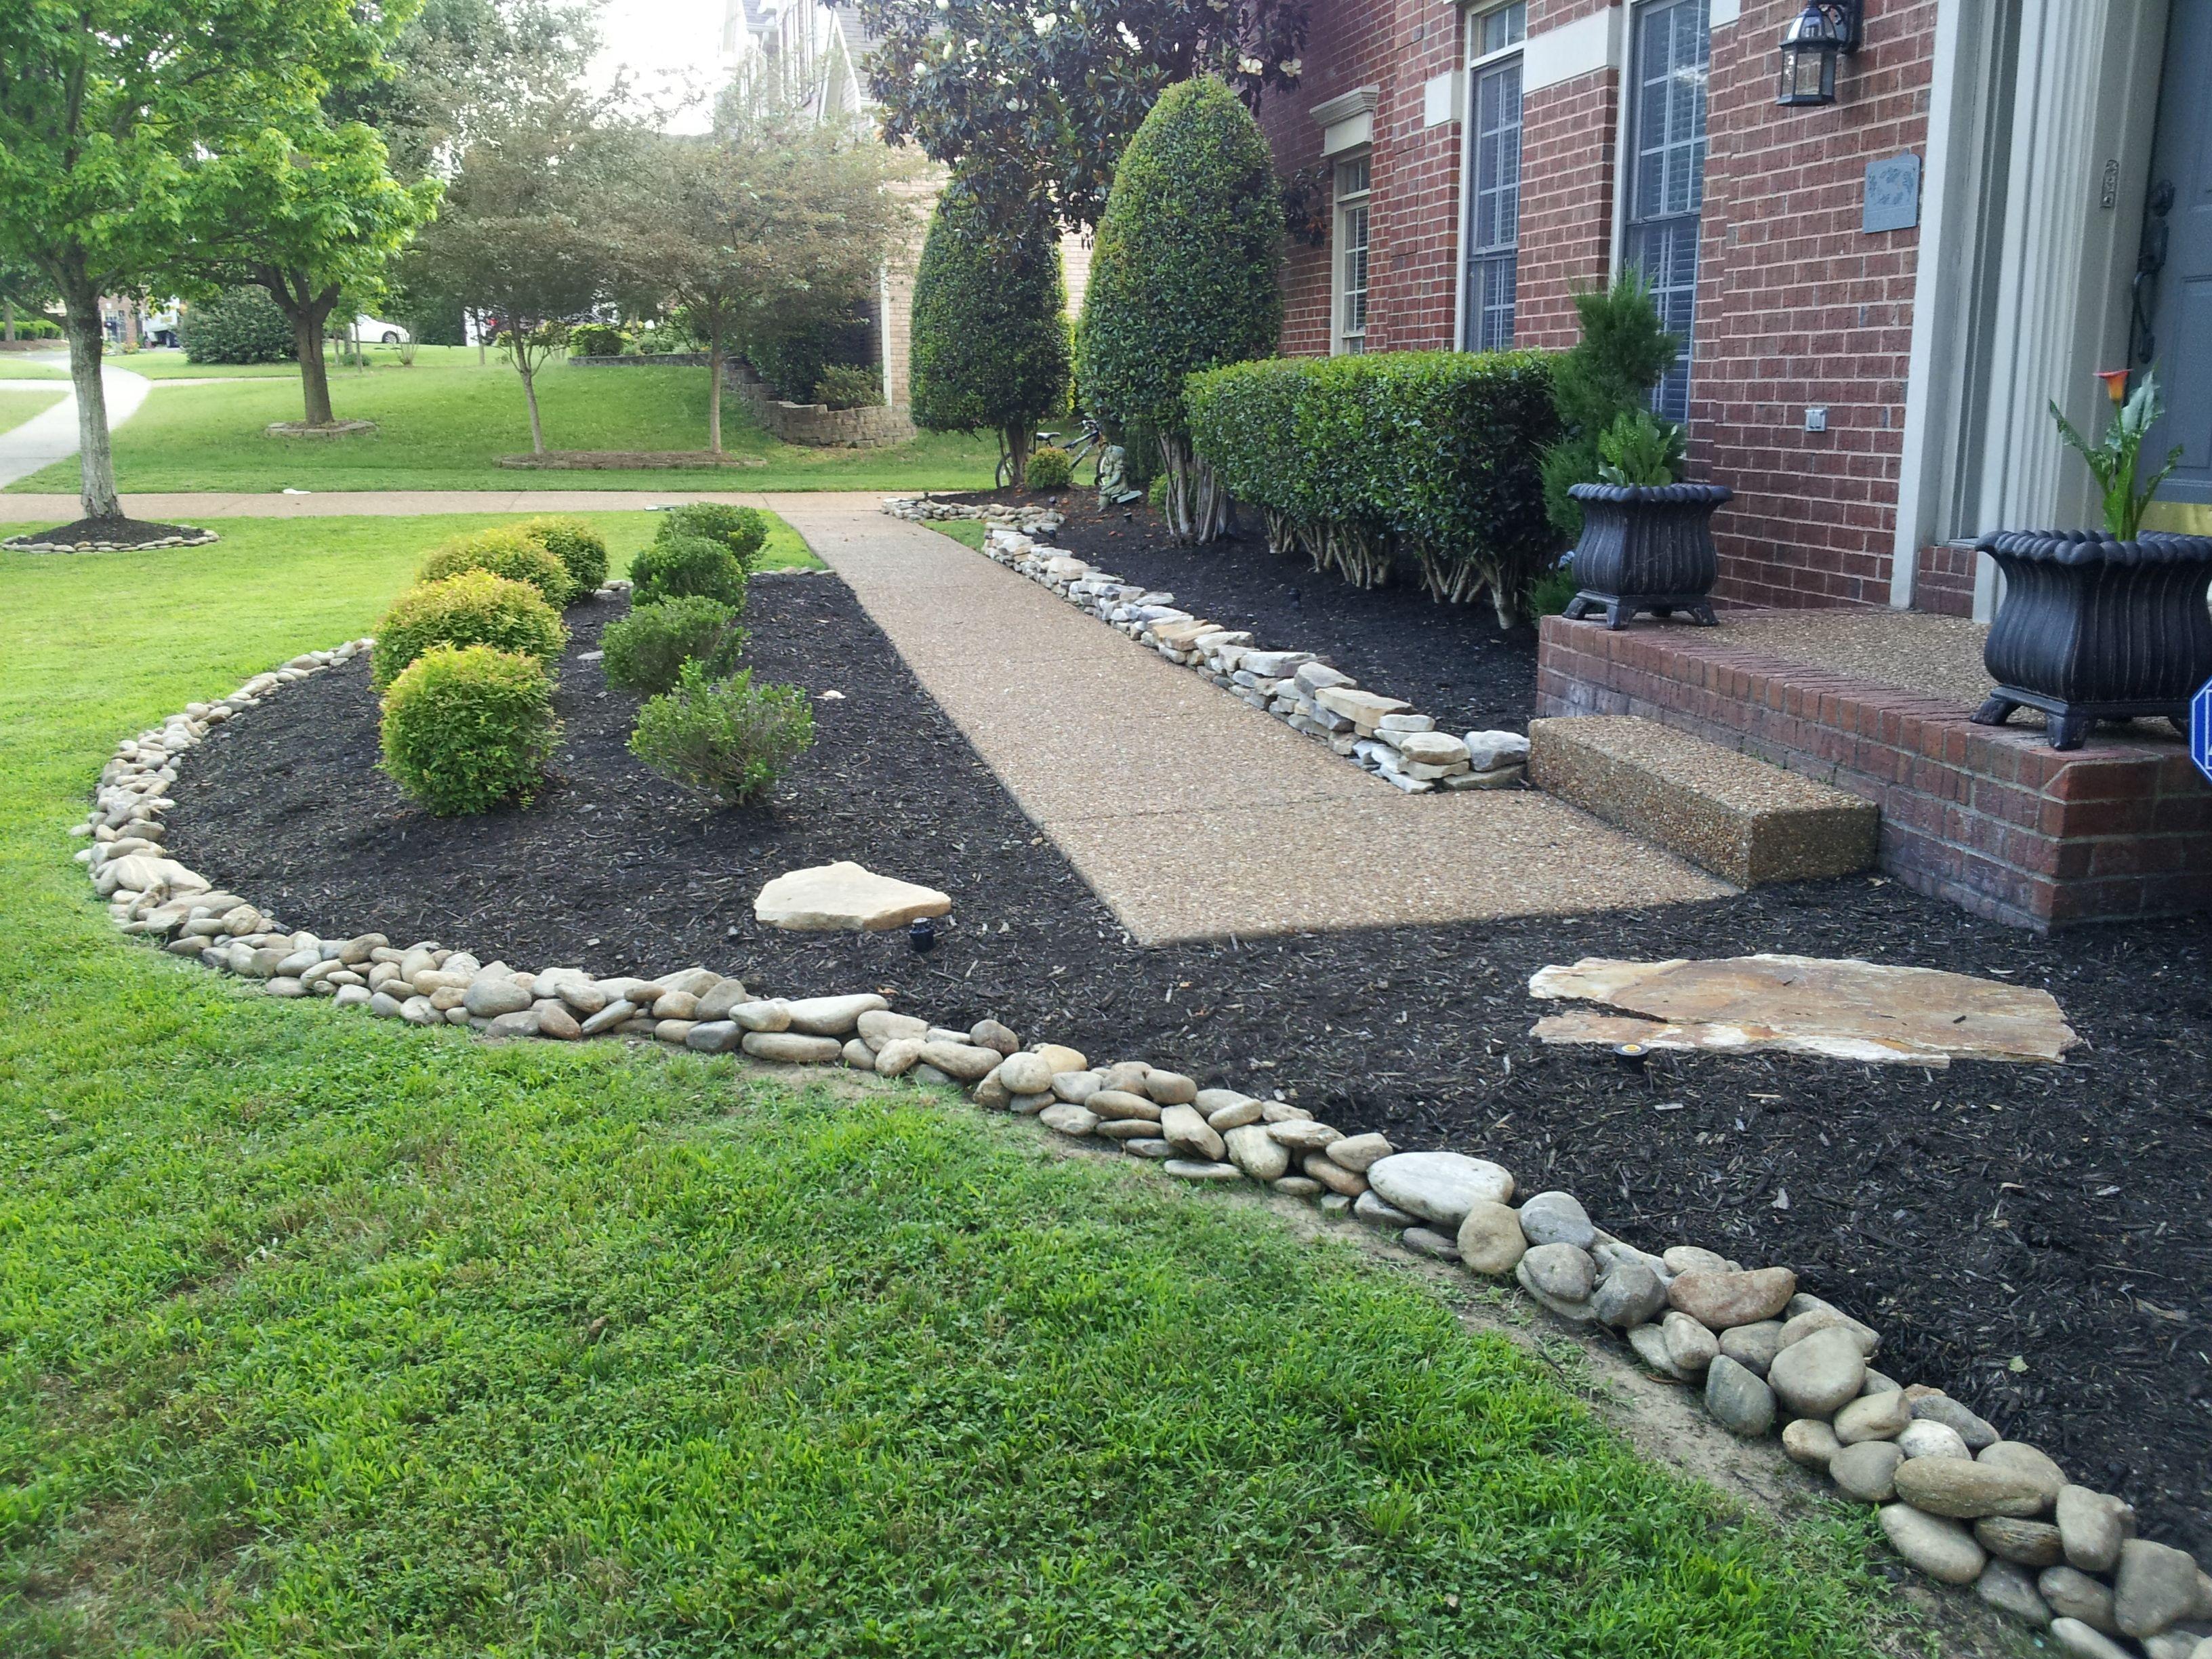 landscaping rocks - stones mulch